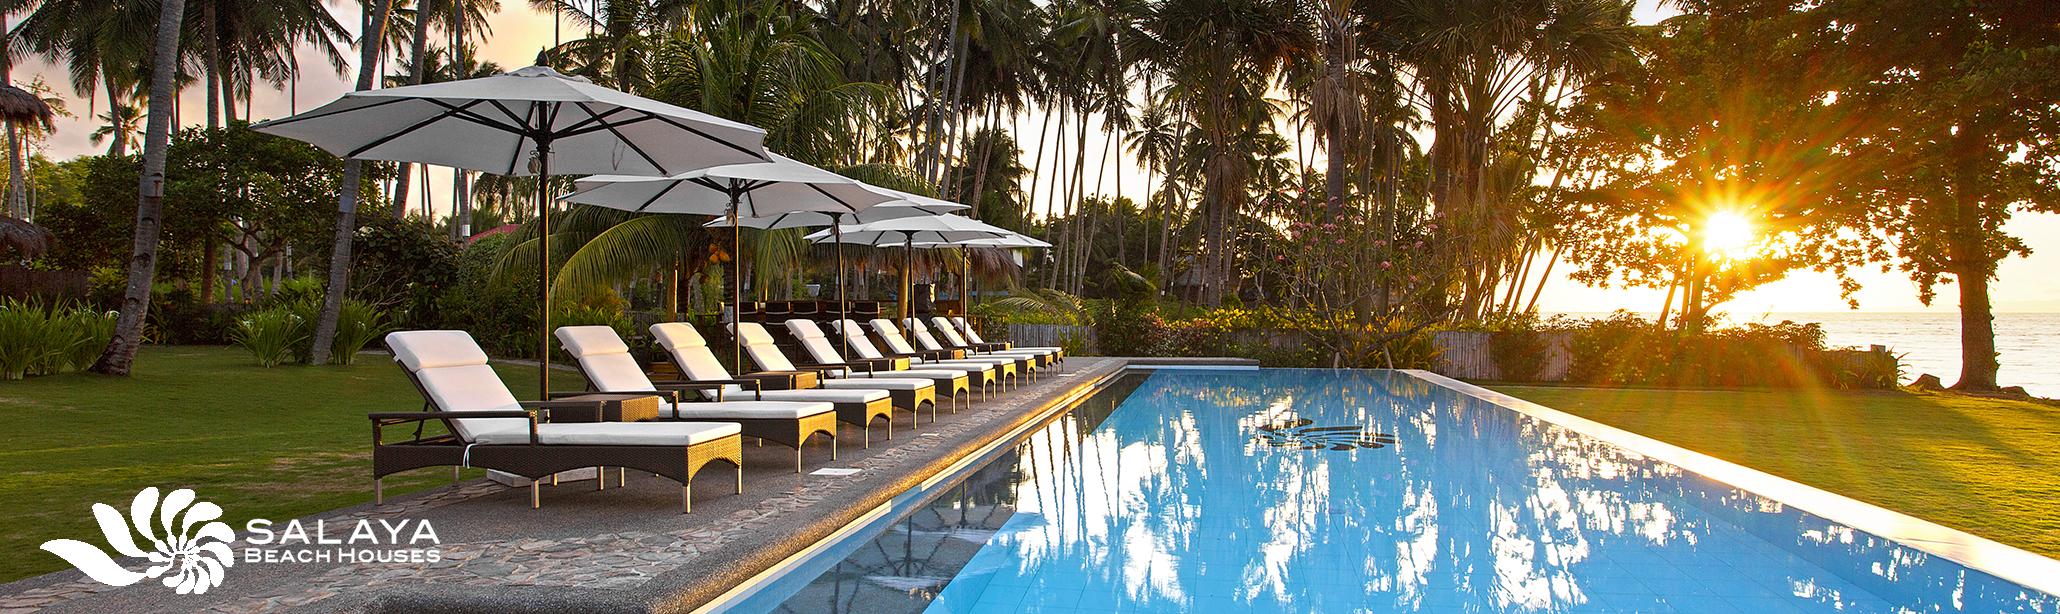 Salaya Beach Houses - Pool